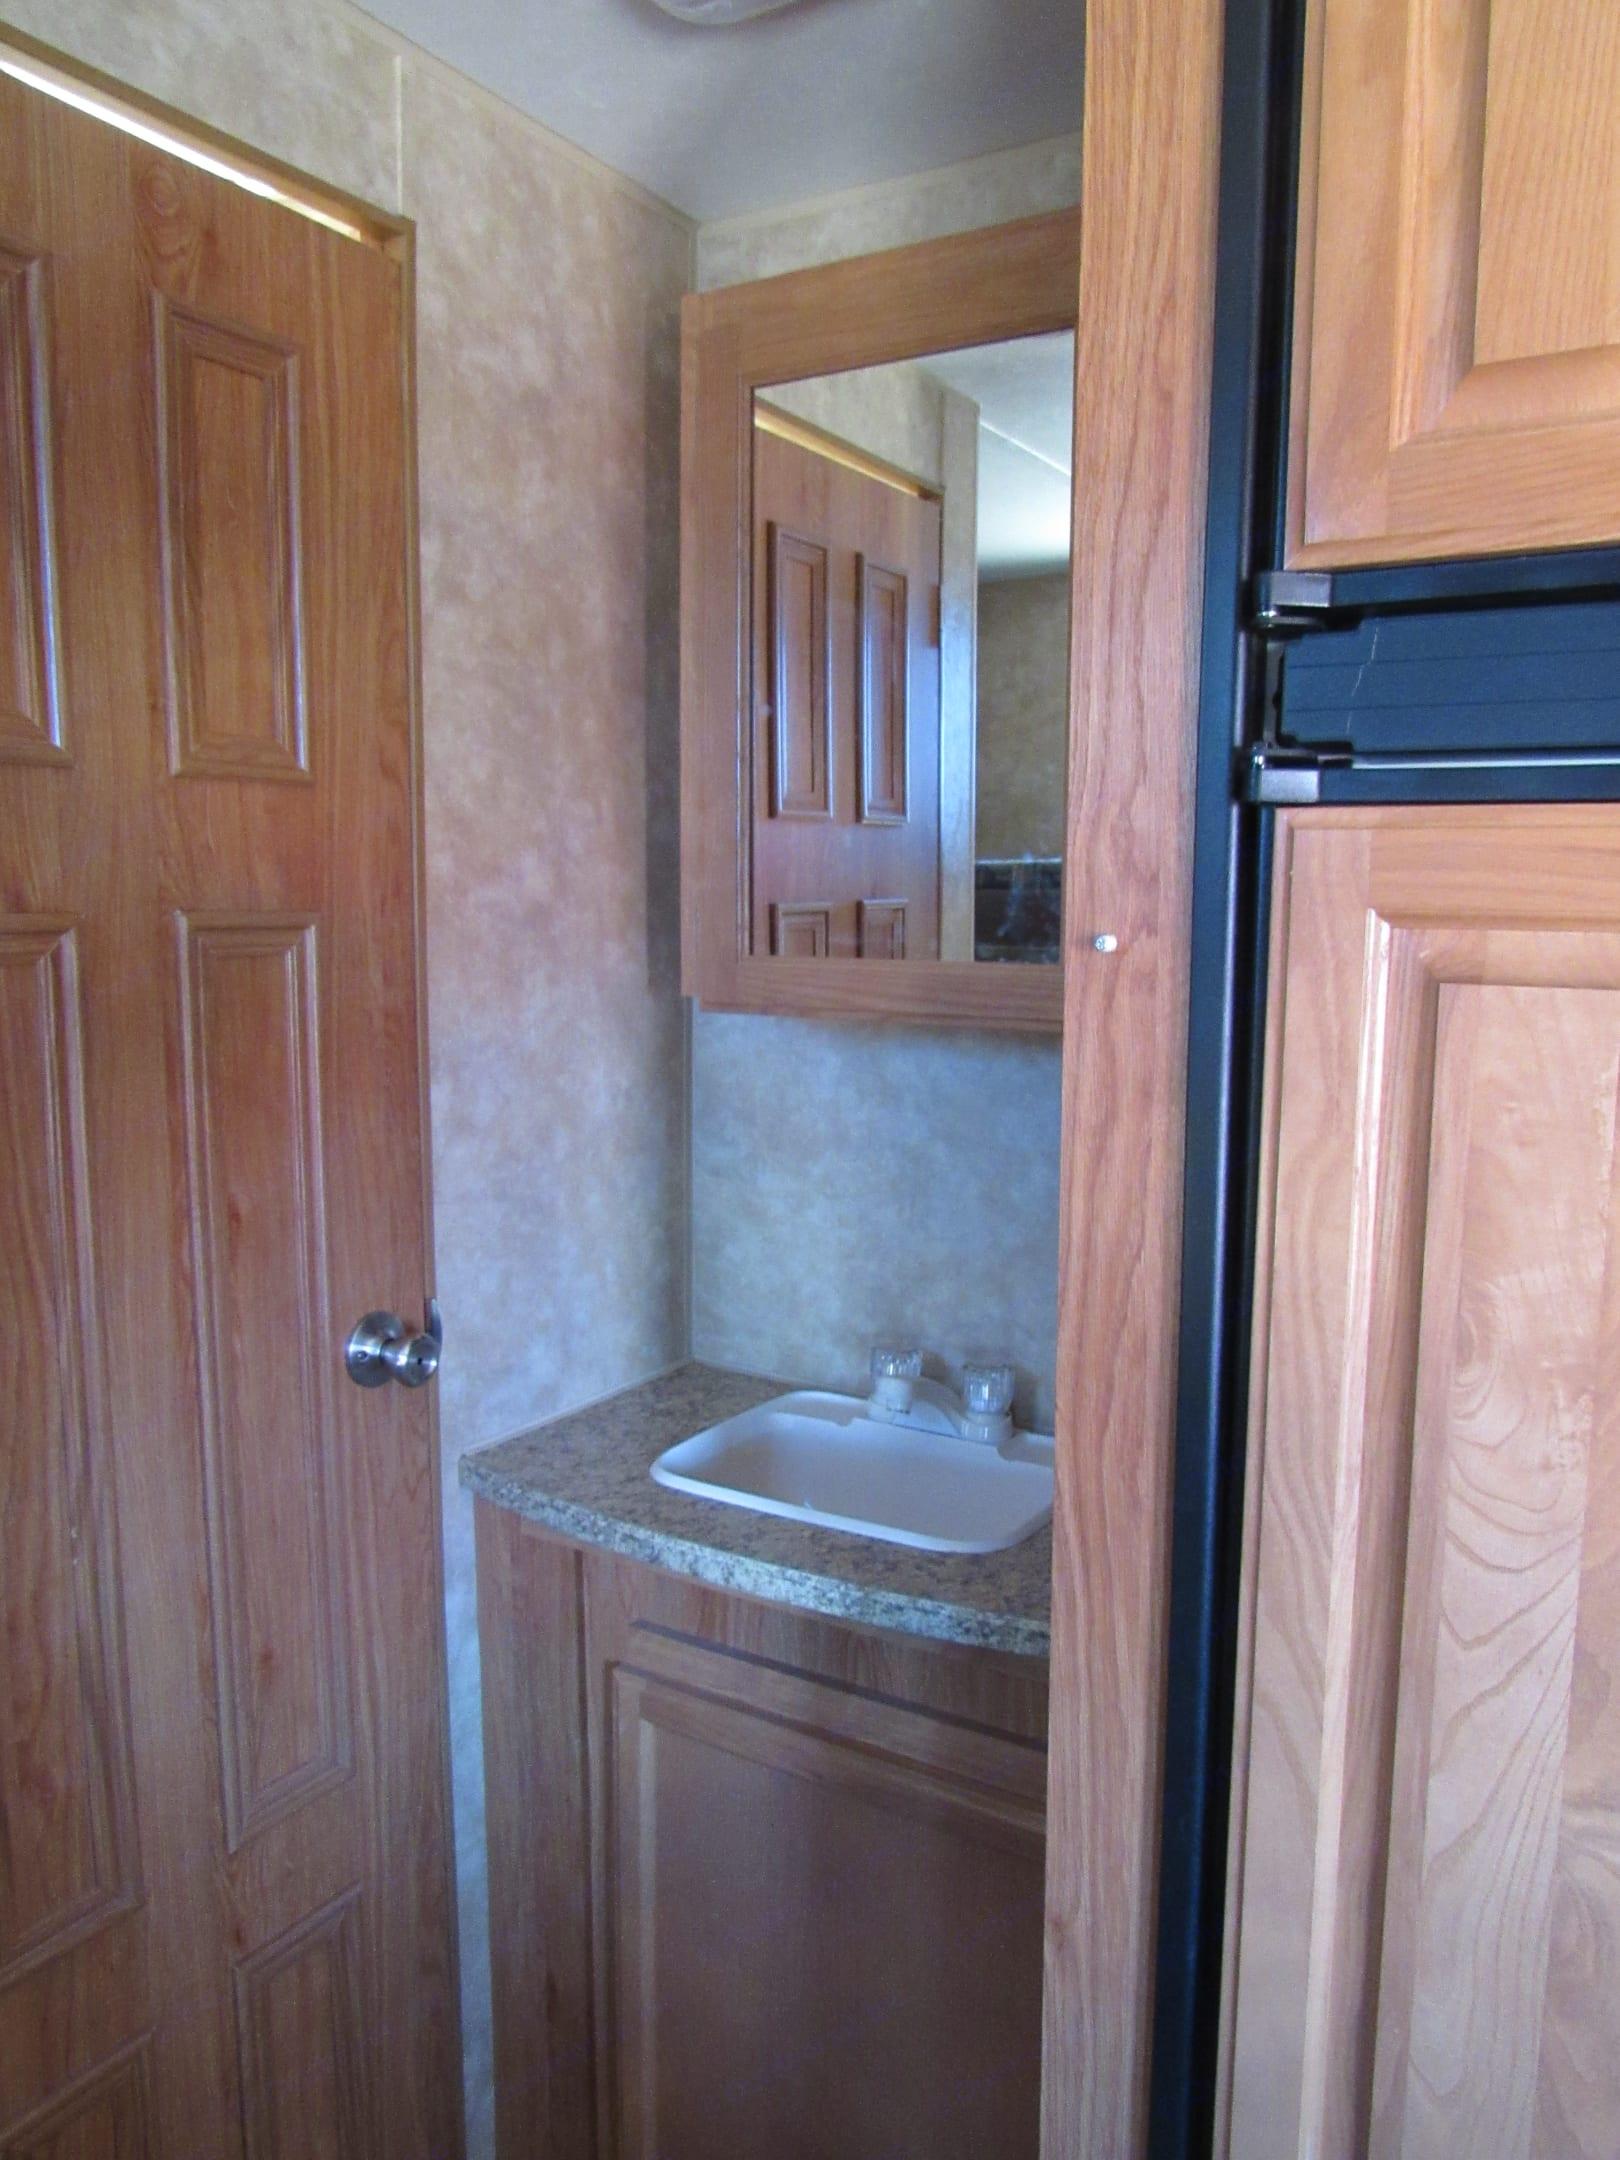 Bathroom sink is outside the bathroom for maximum flexibility.. Jayco Jay Flight 2009